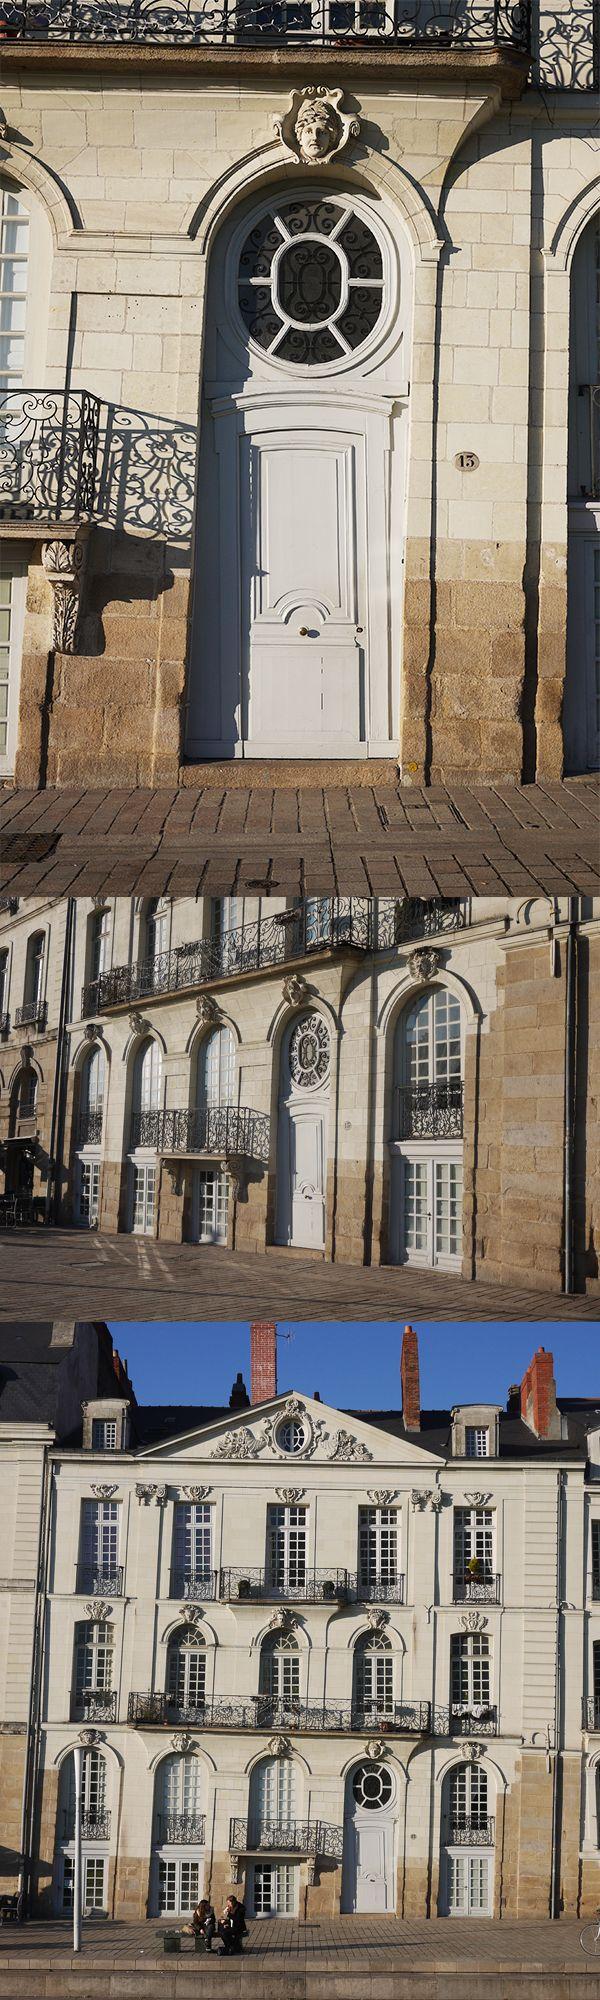 Twisted building - Immeuble Perraudeau 1752 - 13 quai Turenne - Nantes - France